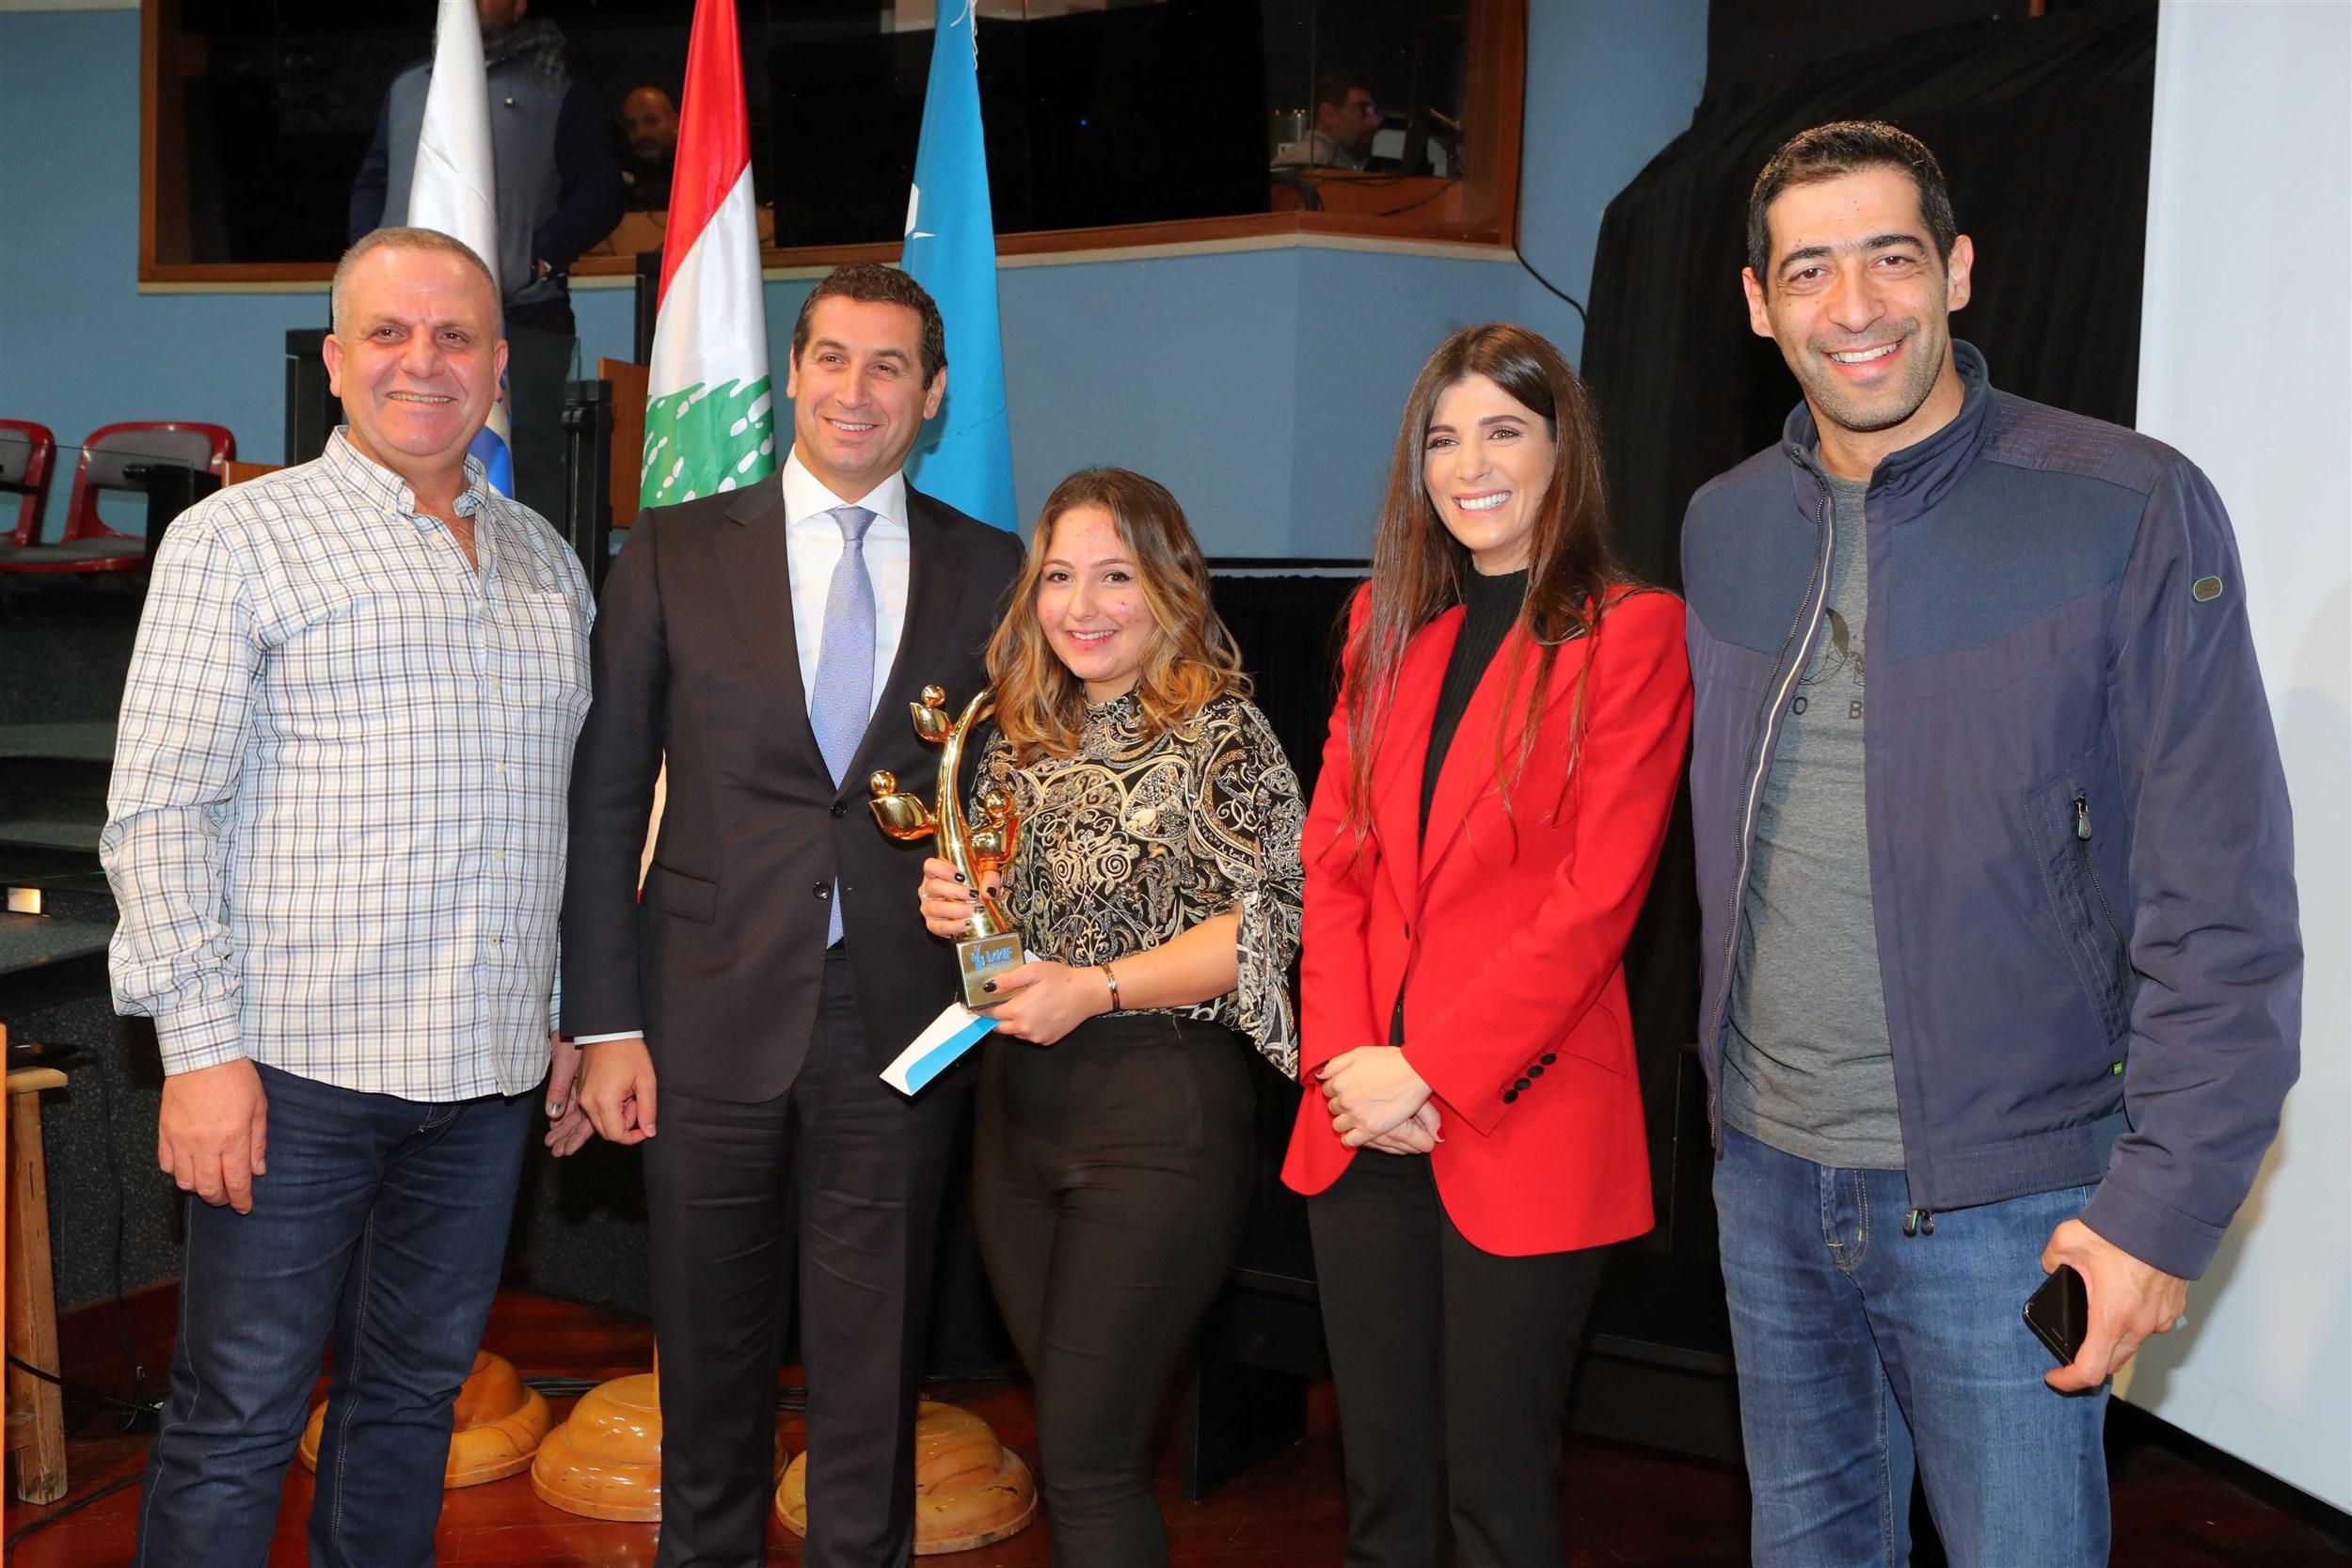 "members  of  the  parliament  mr.  elias  hankach  and  mr. eddy  maalouf with  mrs.  inas  al jarmakani and winner tia wakim for her project ""pharma lebanon""."